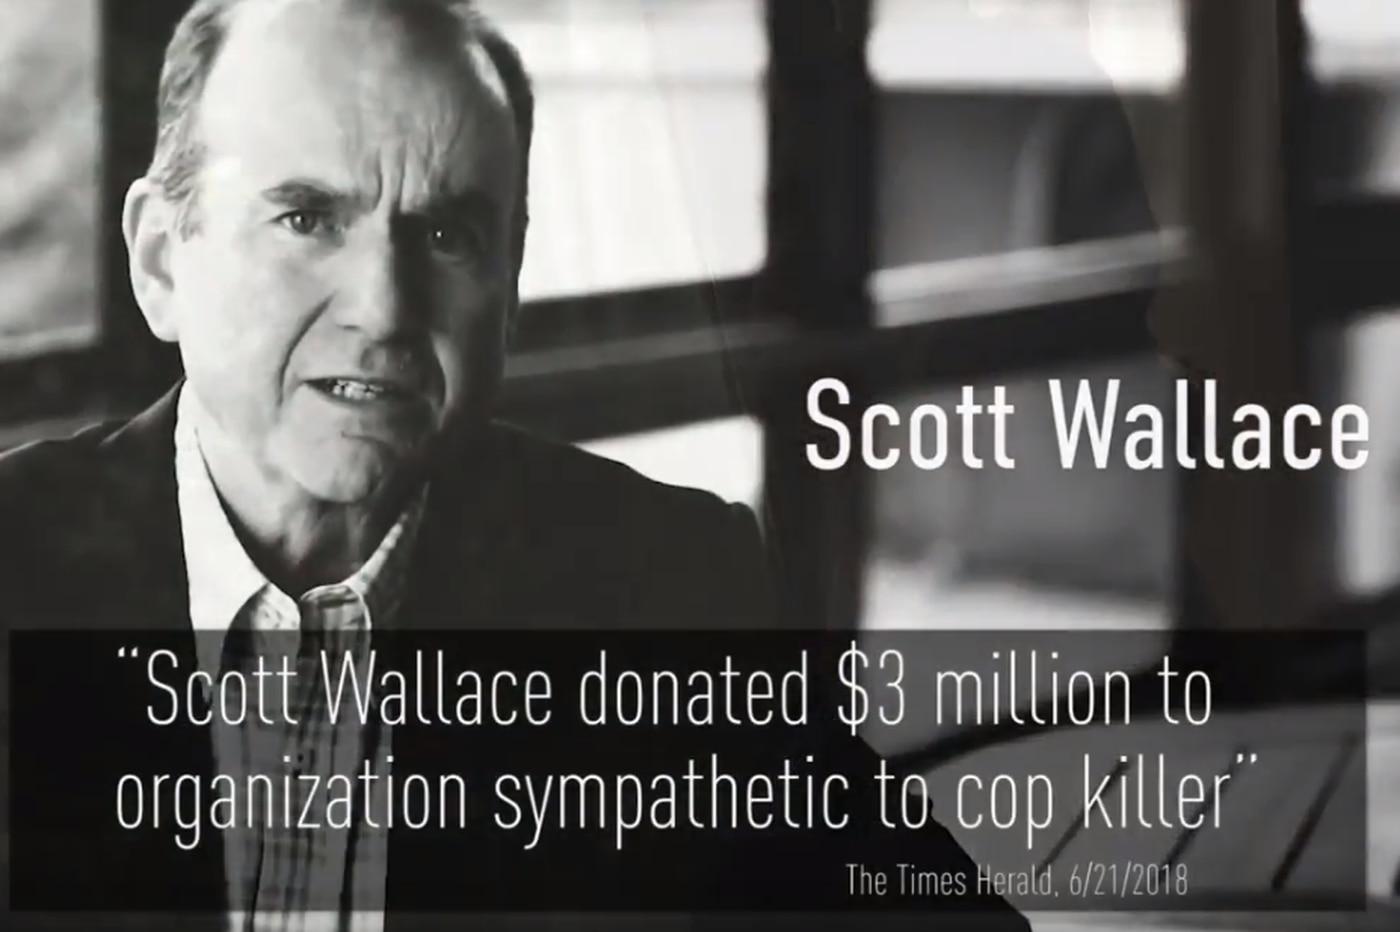 TV stations stop airing ad alleging Democrat Scott Wallace helped fund cop-killer Mumia Abu-Jamal's defense